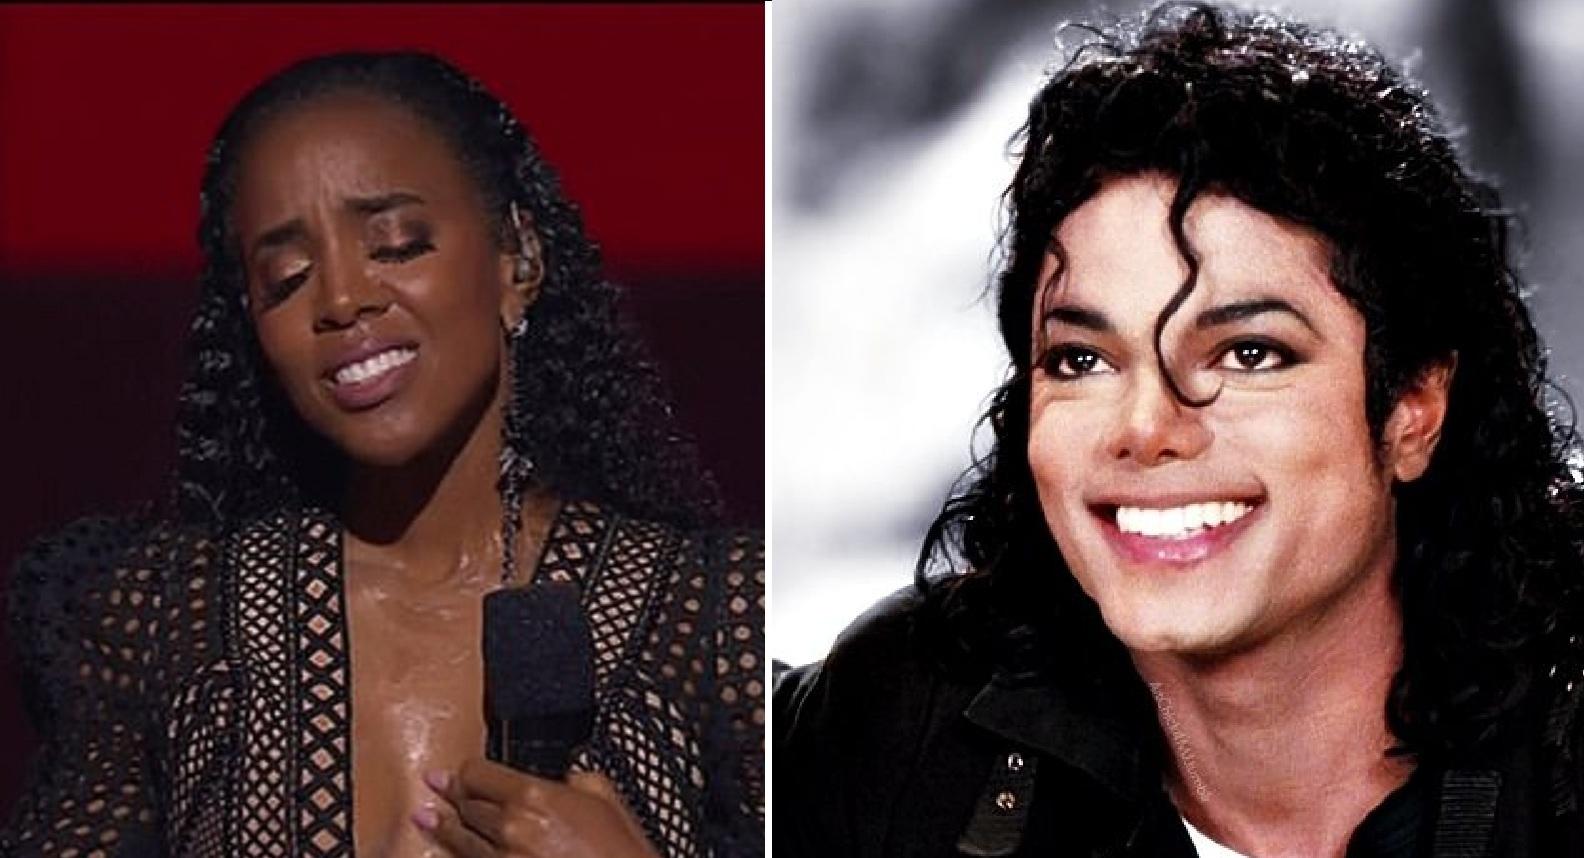 Watch: Kelly Rowland Stuns The Voice Australia With Michael Jackson